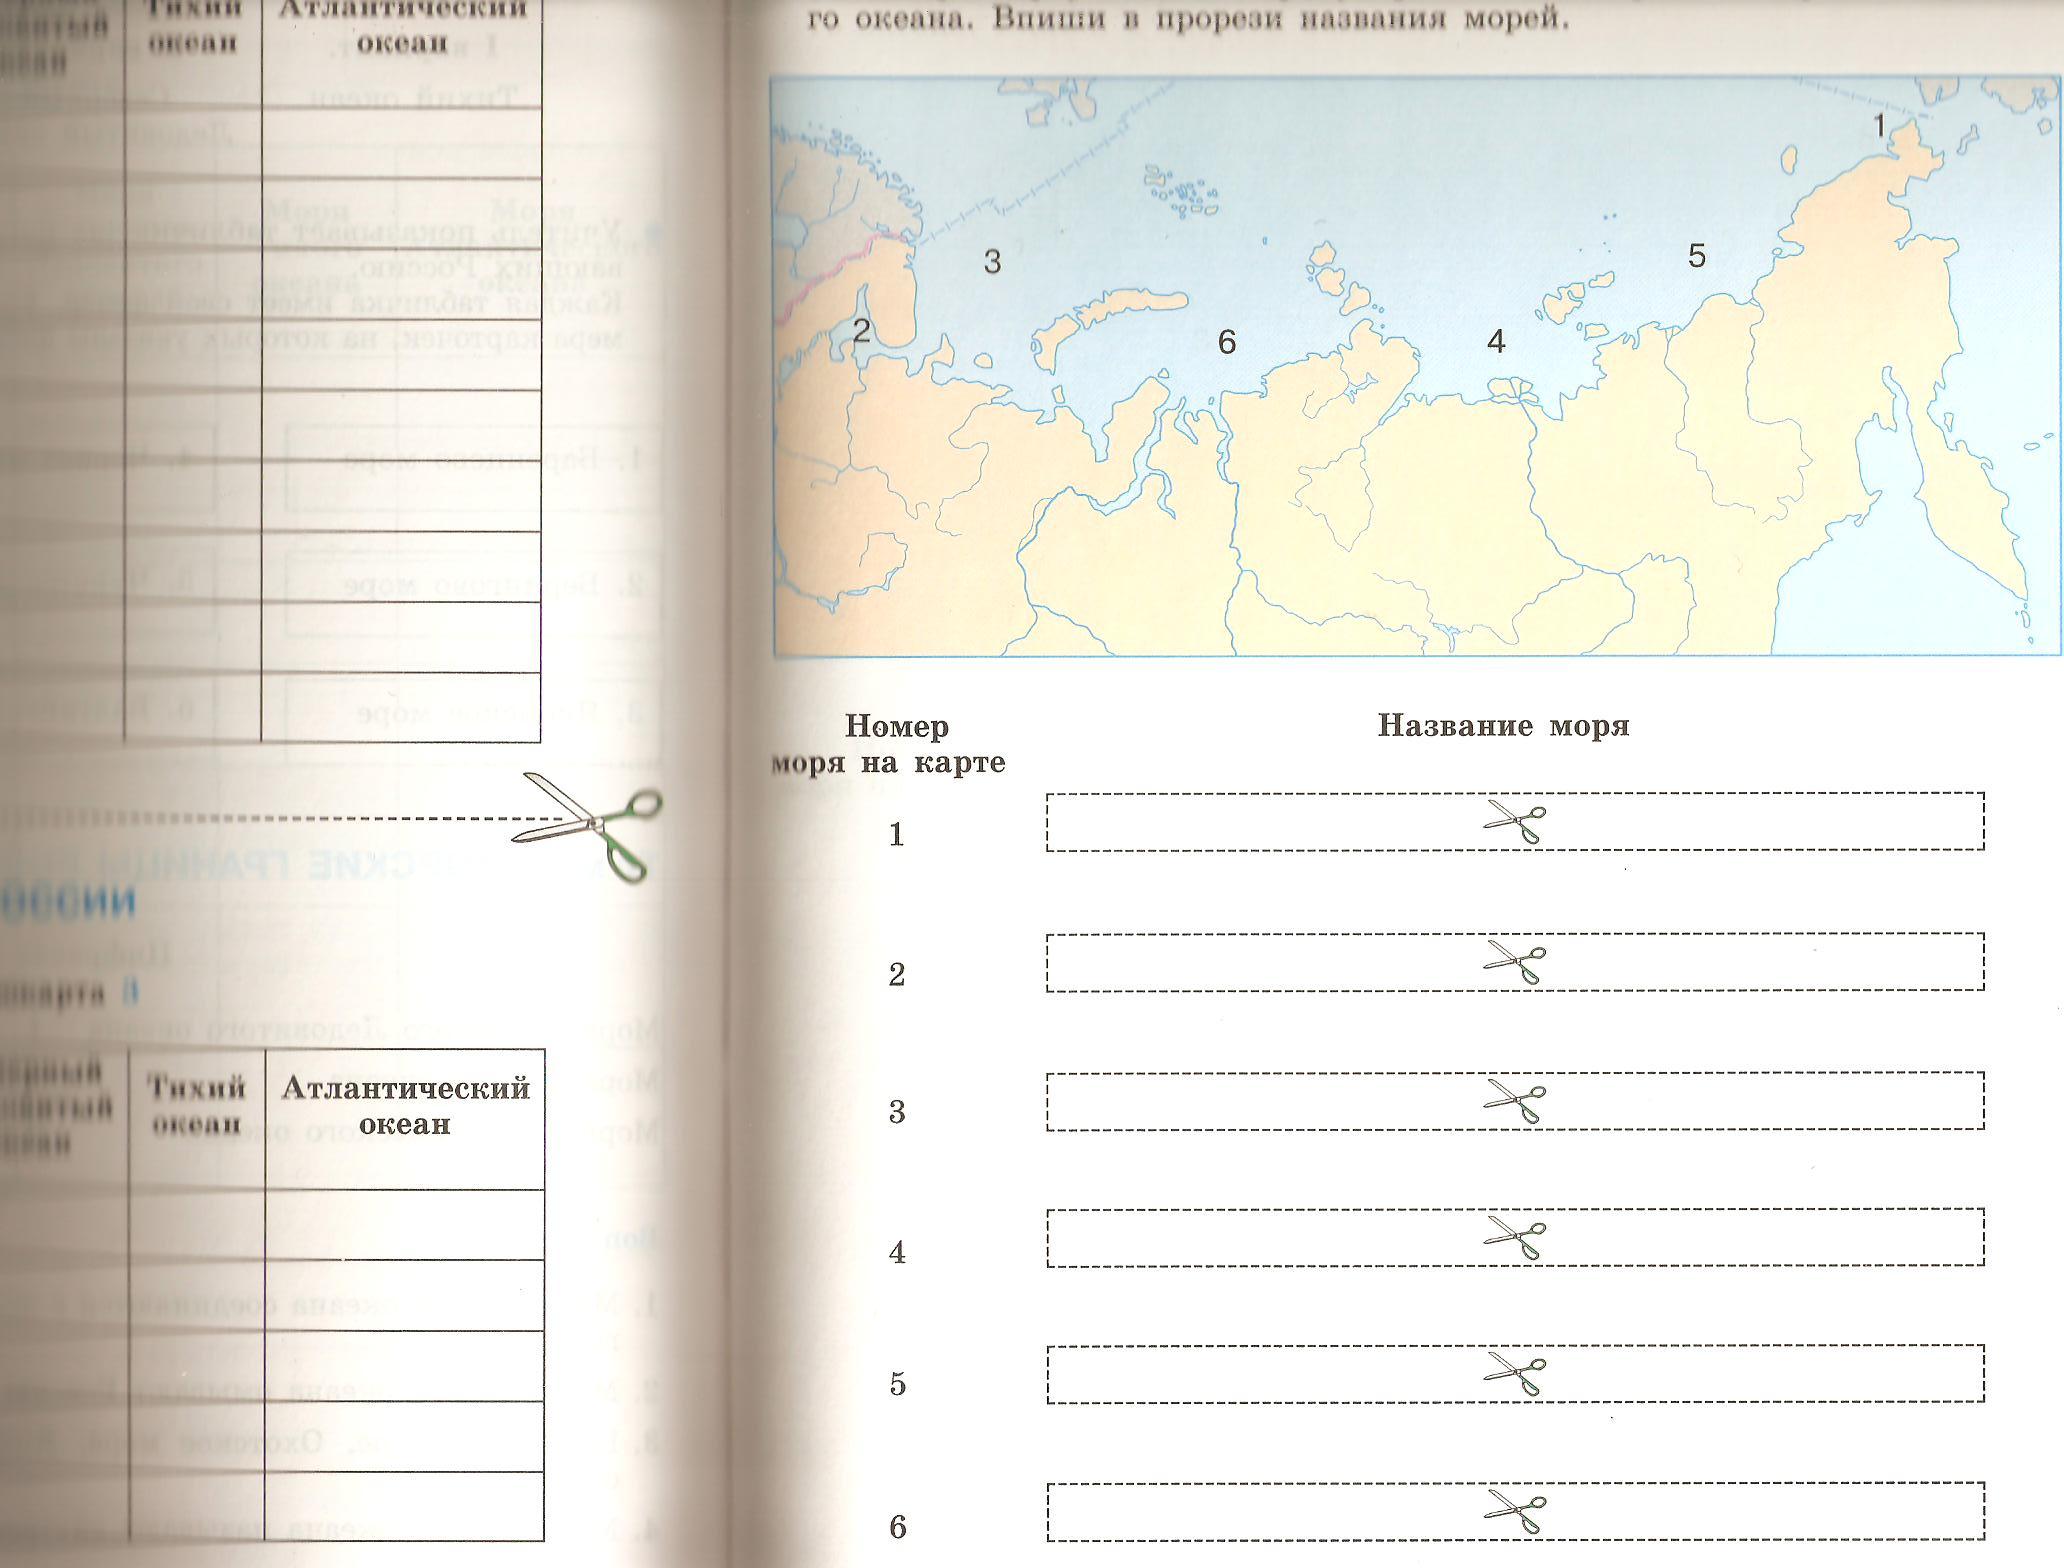 C:\Documents and Settings\Наталья\Рабочий стол\Изображение.jpg